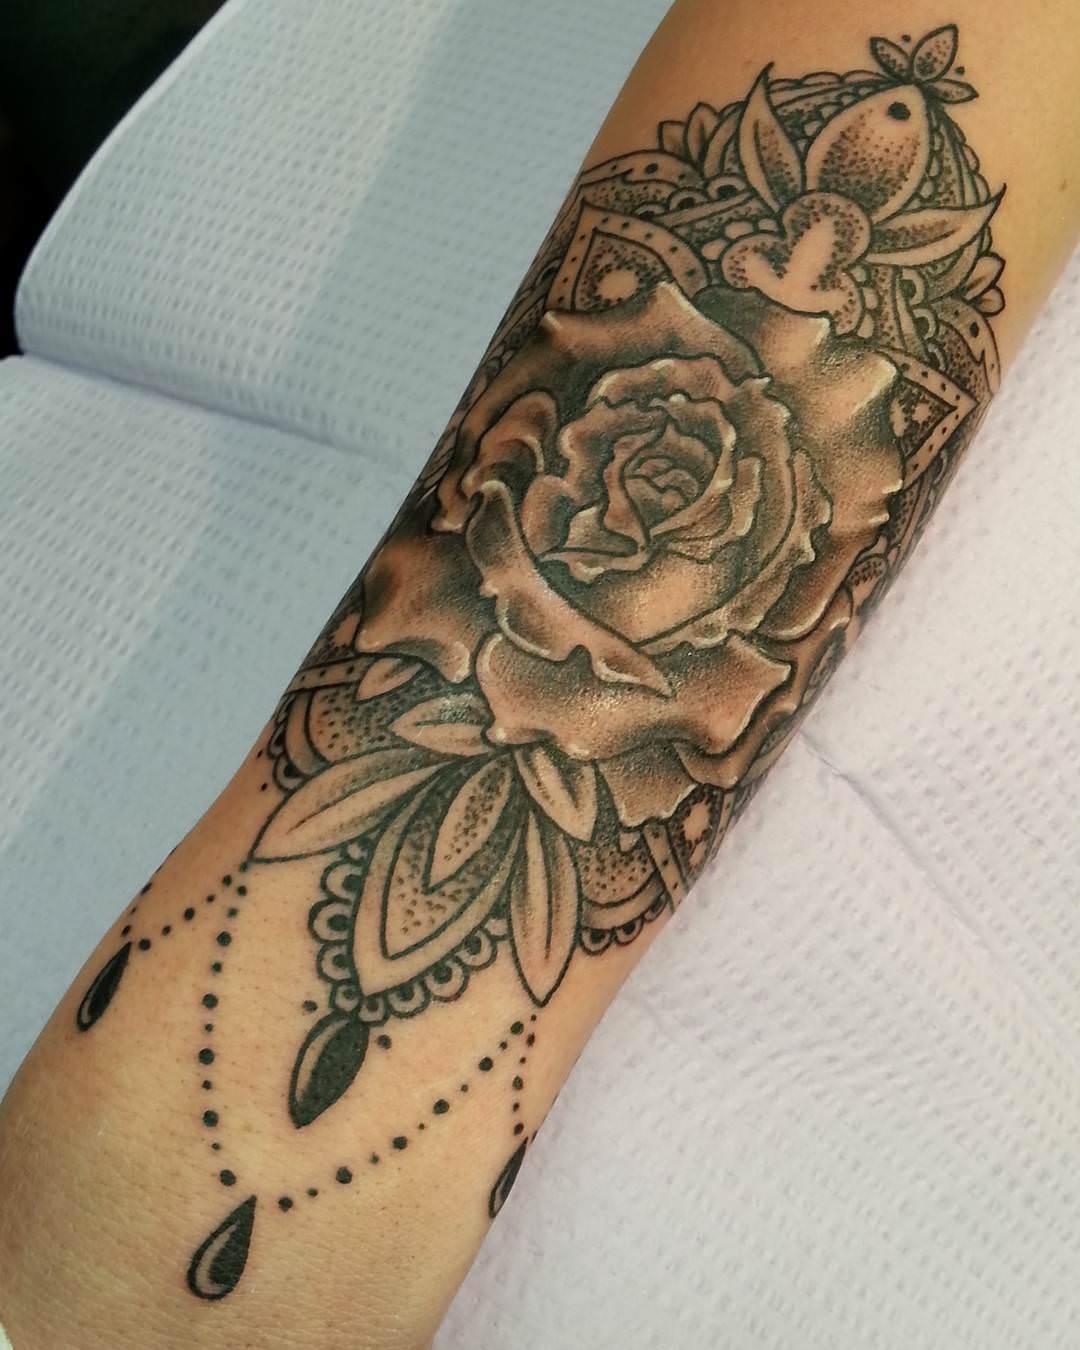 28 designer tattoos 50 impressive memorial tattoos designs best tattoos 33 beautiful. Black Bedroom Furniture Sets. Home Design Ideas